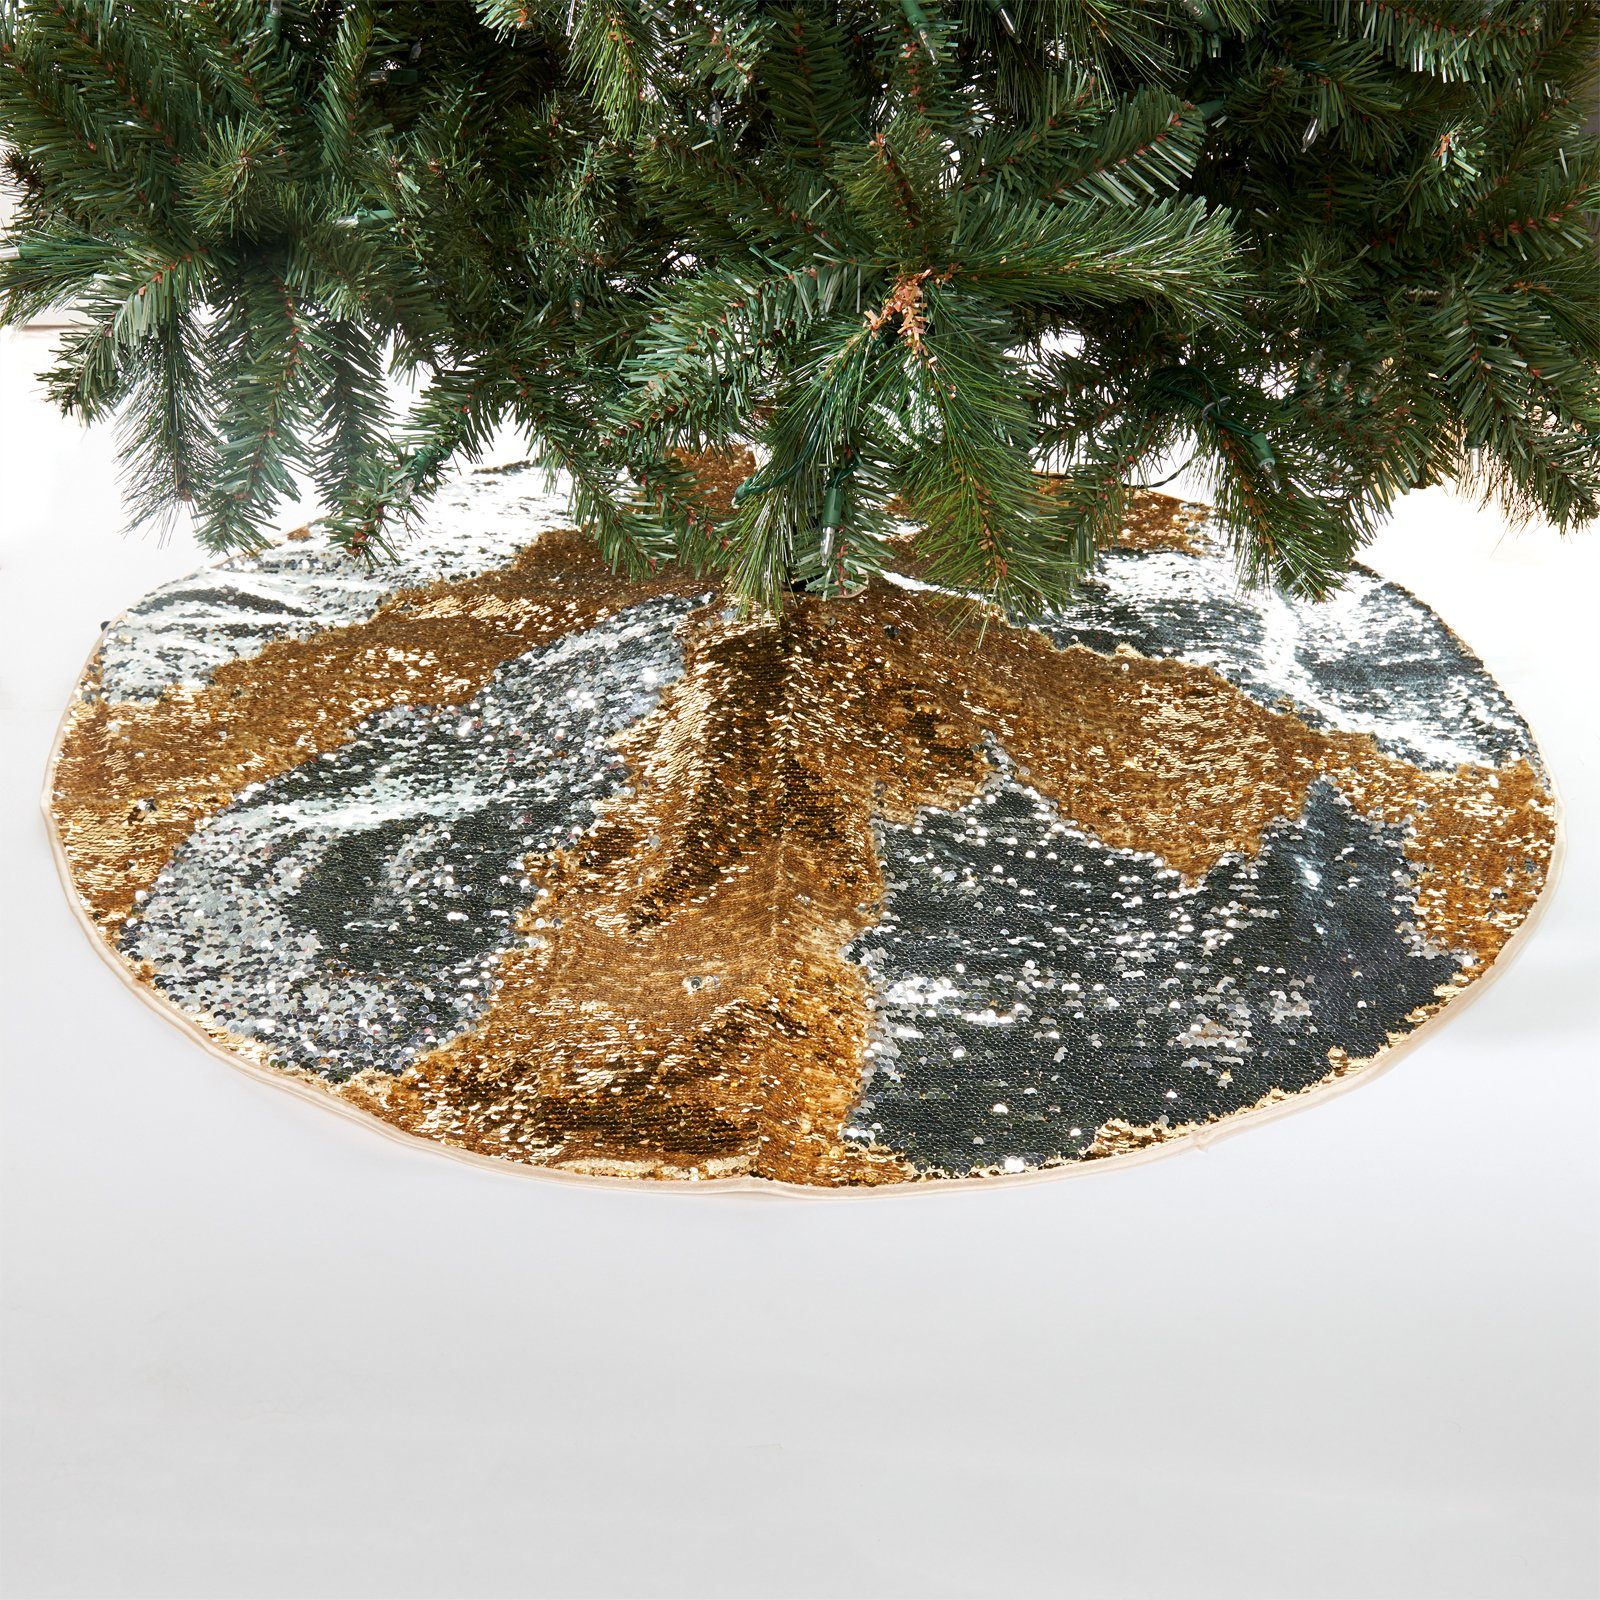 Gold & Silver Reversible Sequin Christmas Tree Skirt